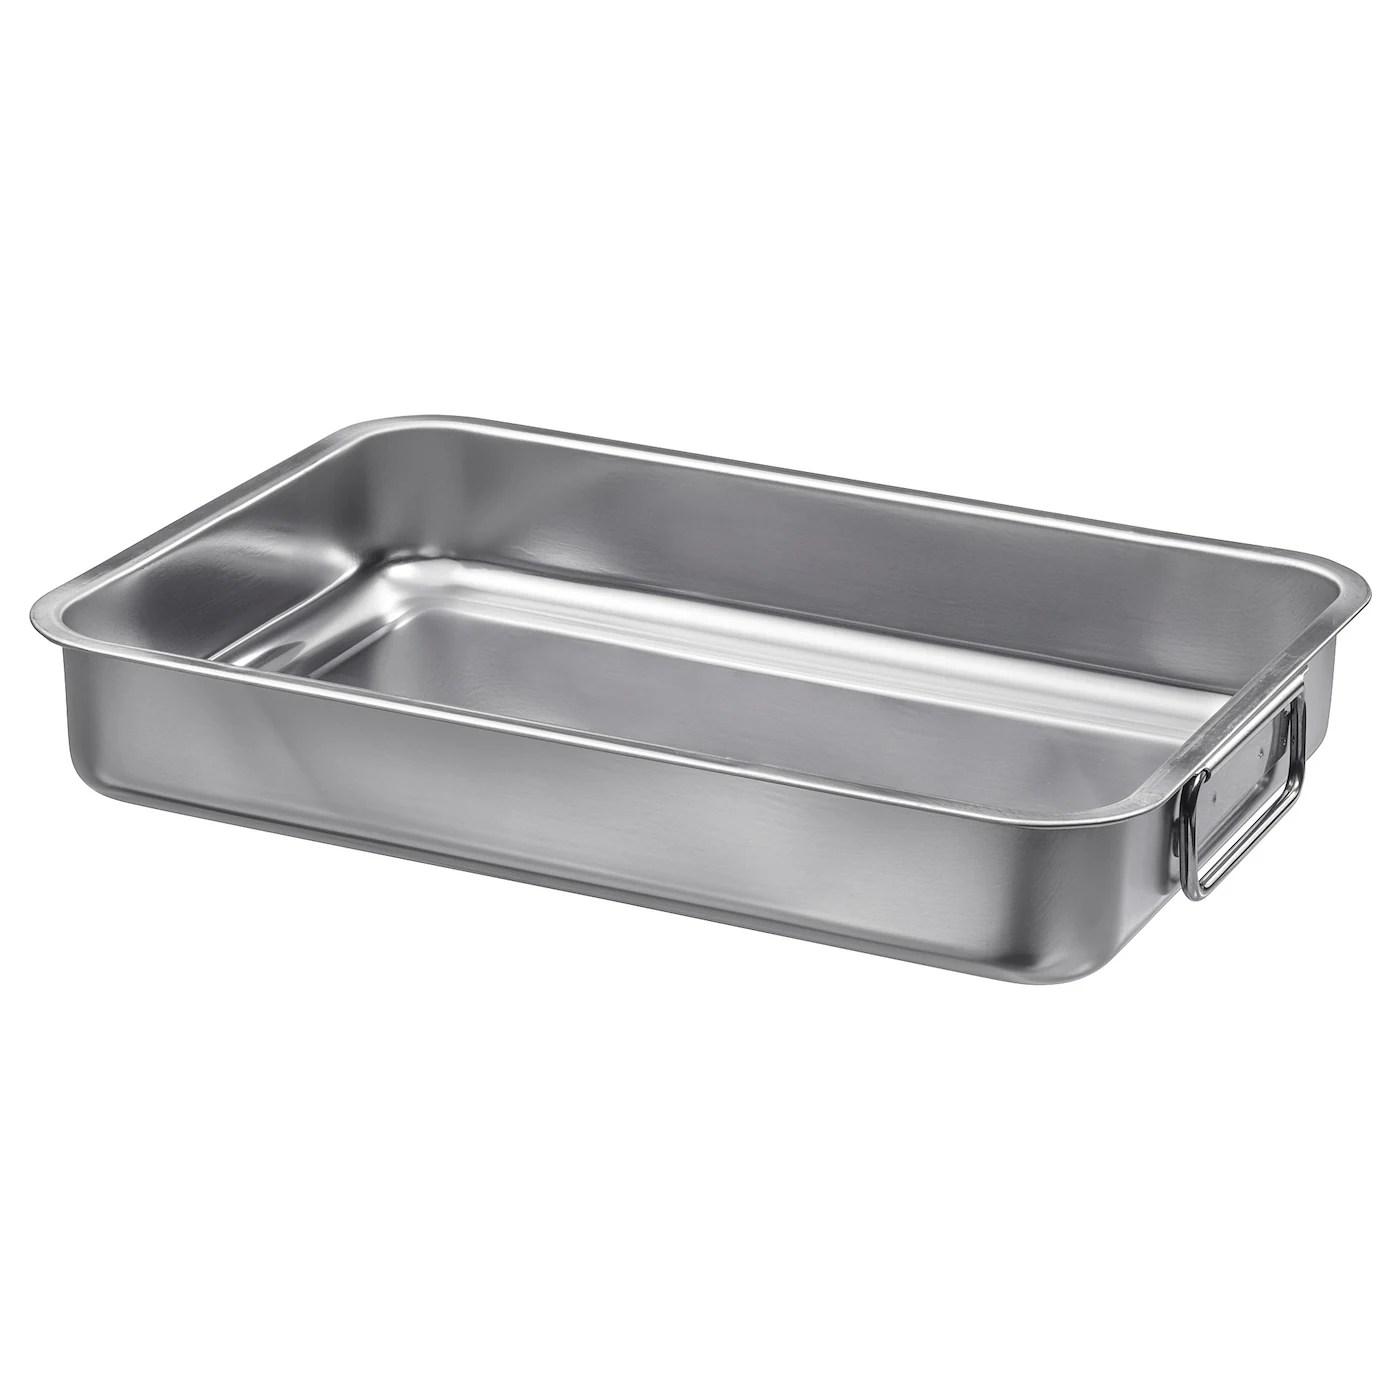 koncis roasting tin stainless steel 34x24 cm